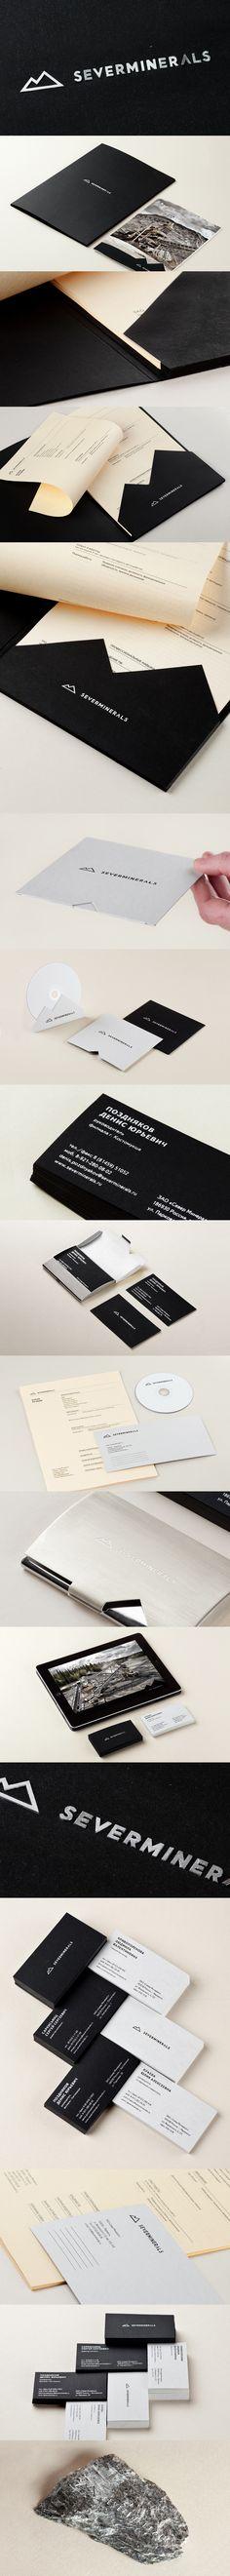 Severminerals, Identity Branding Suite. Black. Silver. Business Card. Letterhead.